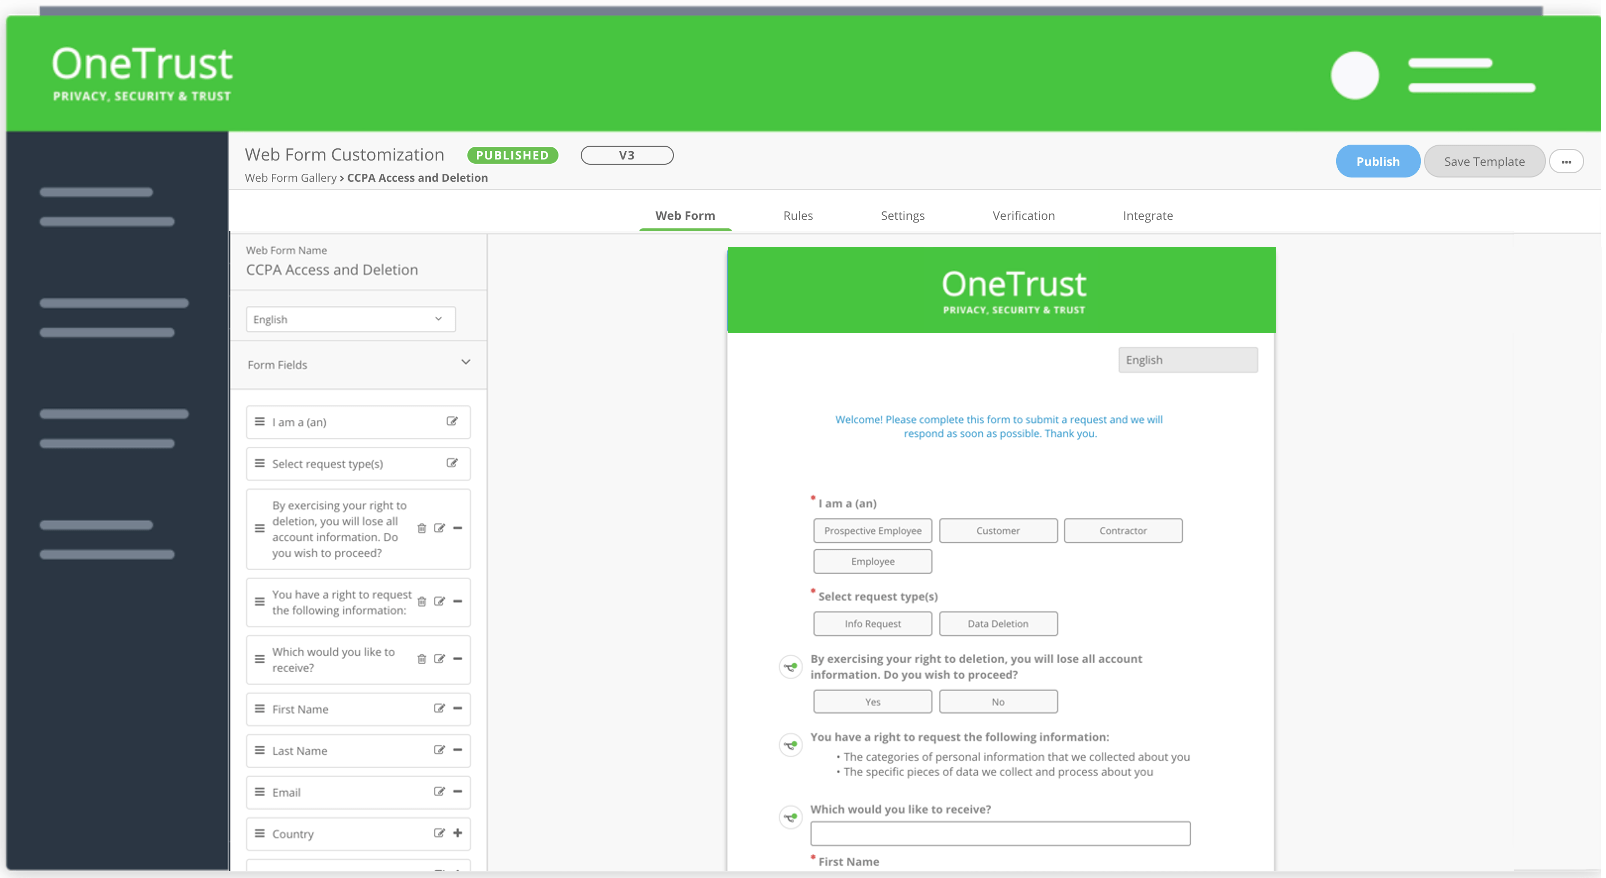 DSAR Webform Intake Template